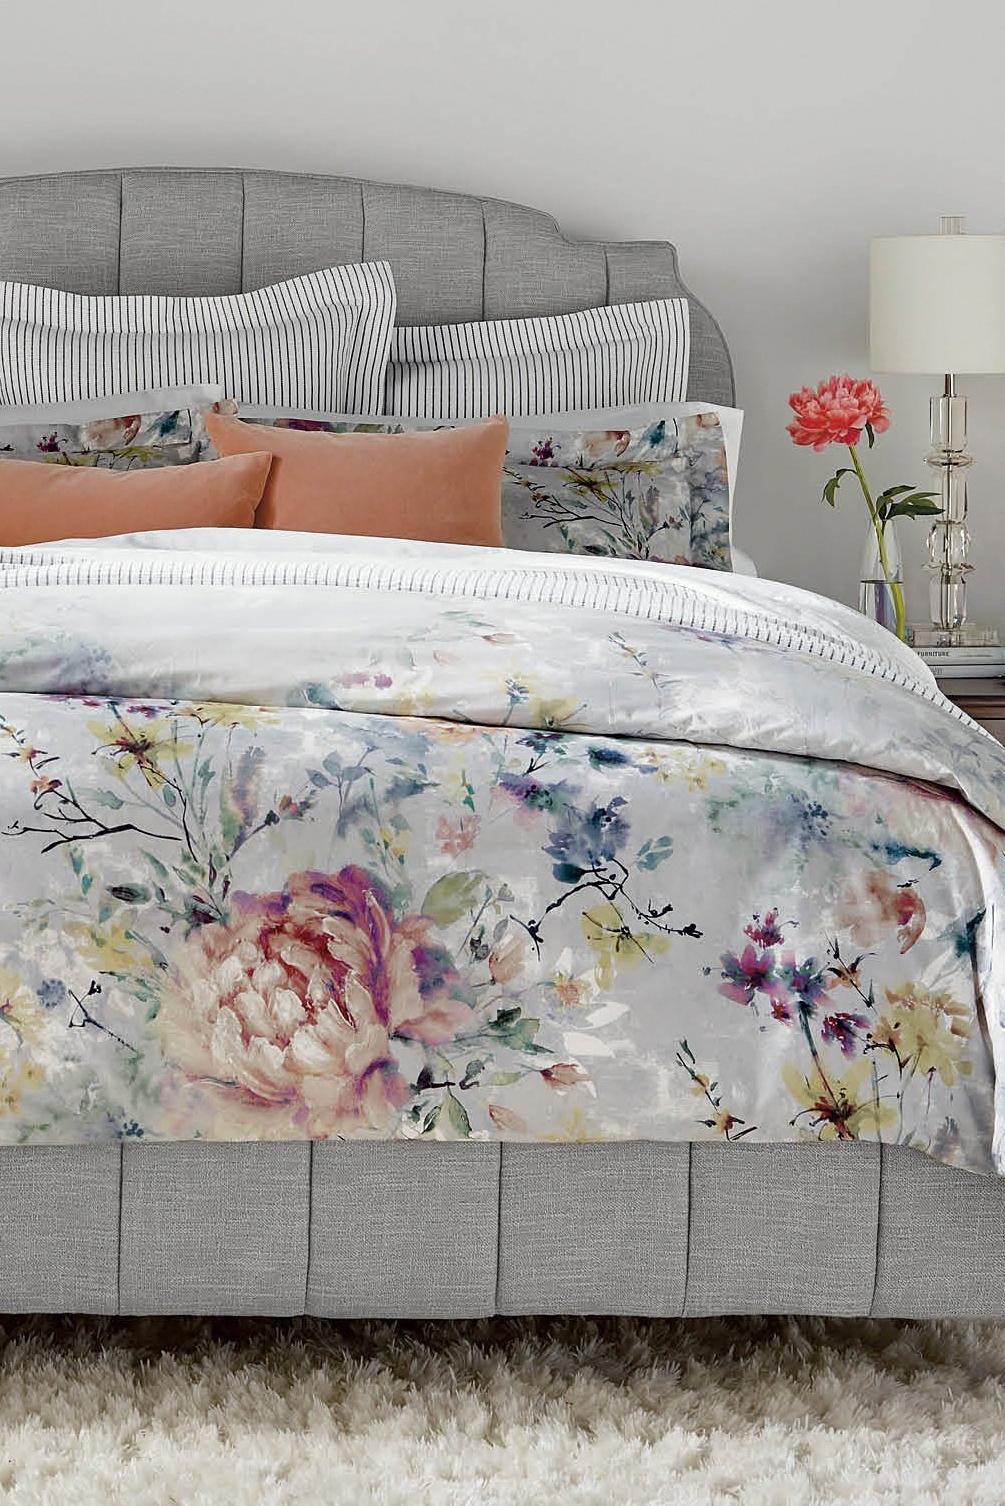 Photo of Bedding Comforter Sets Twin #WonderfulBedLinenIdeas id:7352458122 #FavouriteBedl…